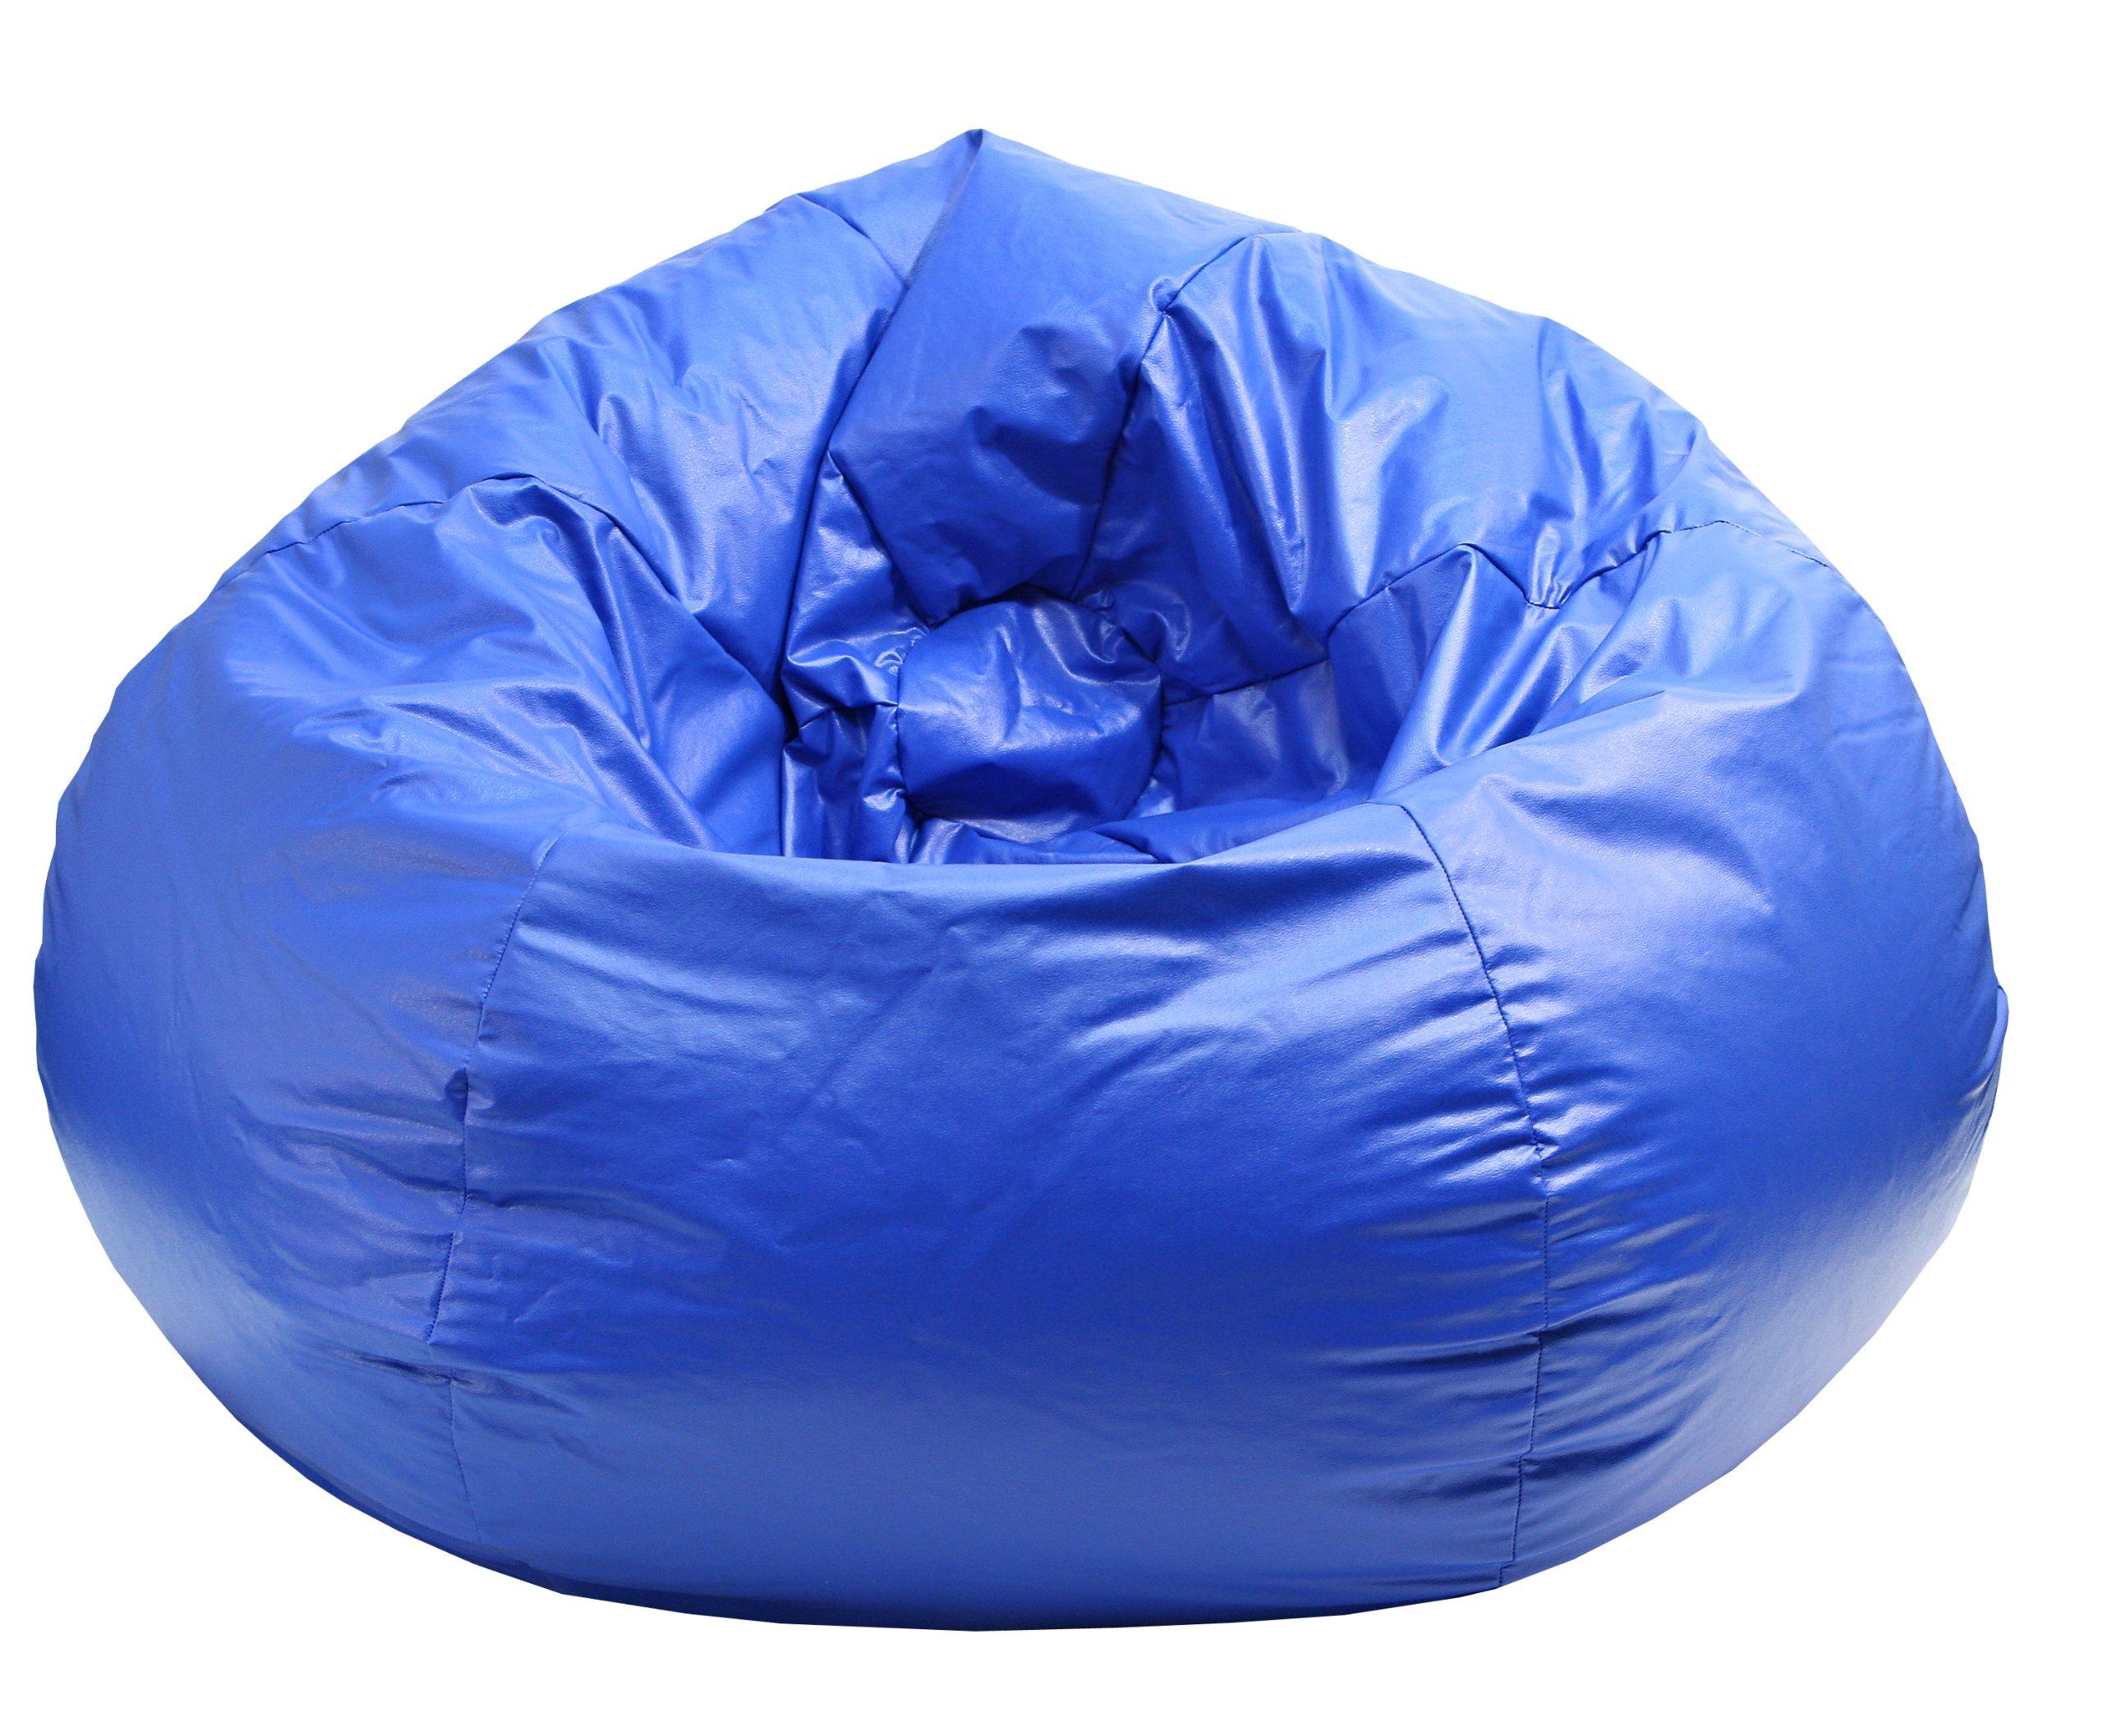 Gold Medal Bean Bags Medium Wet Look Vinyl Beanbag, Tween Size, Blue by Gold Medal Bean Bags